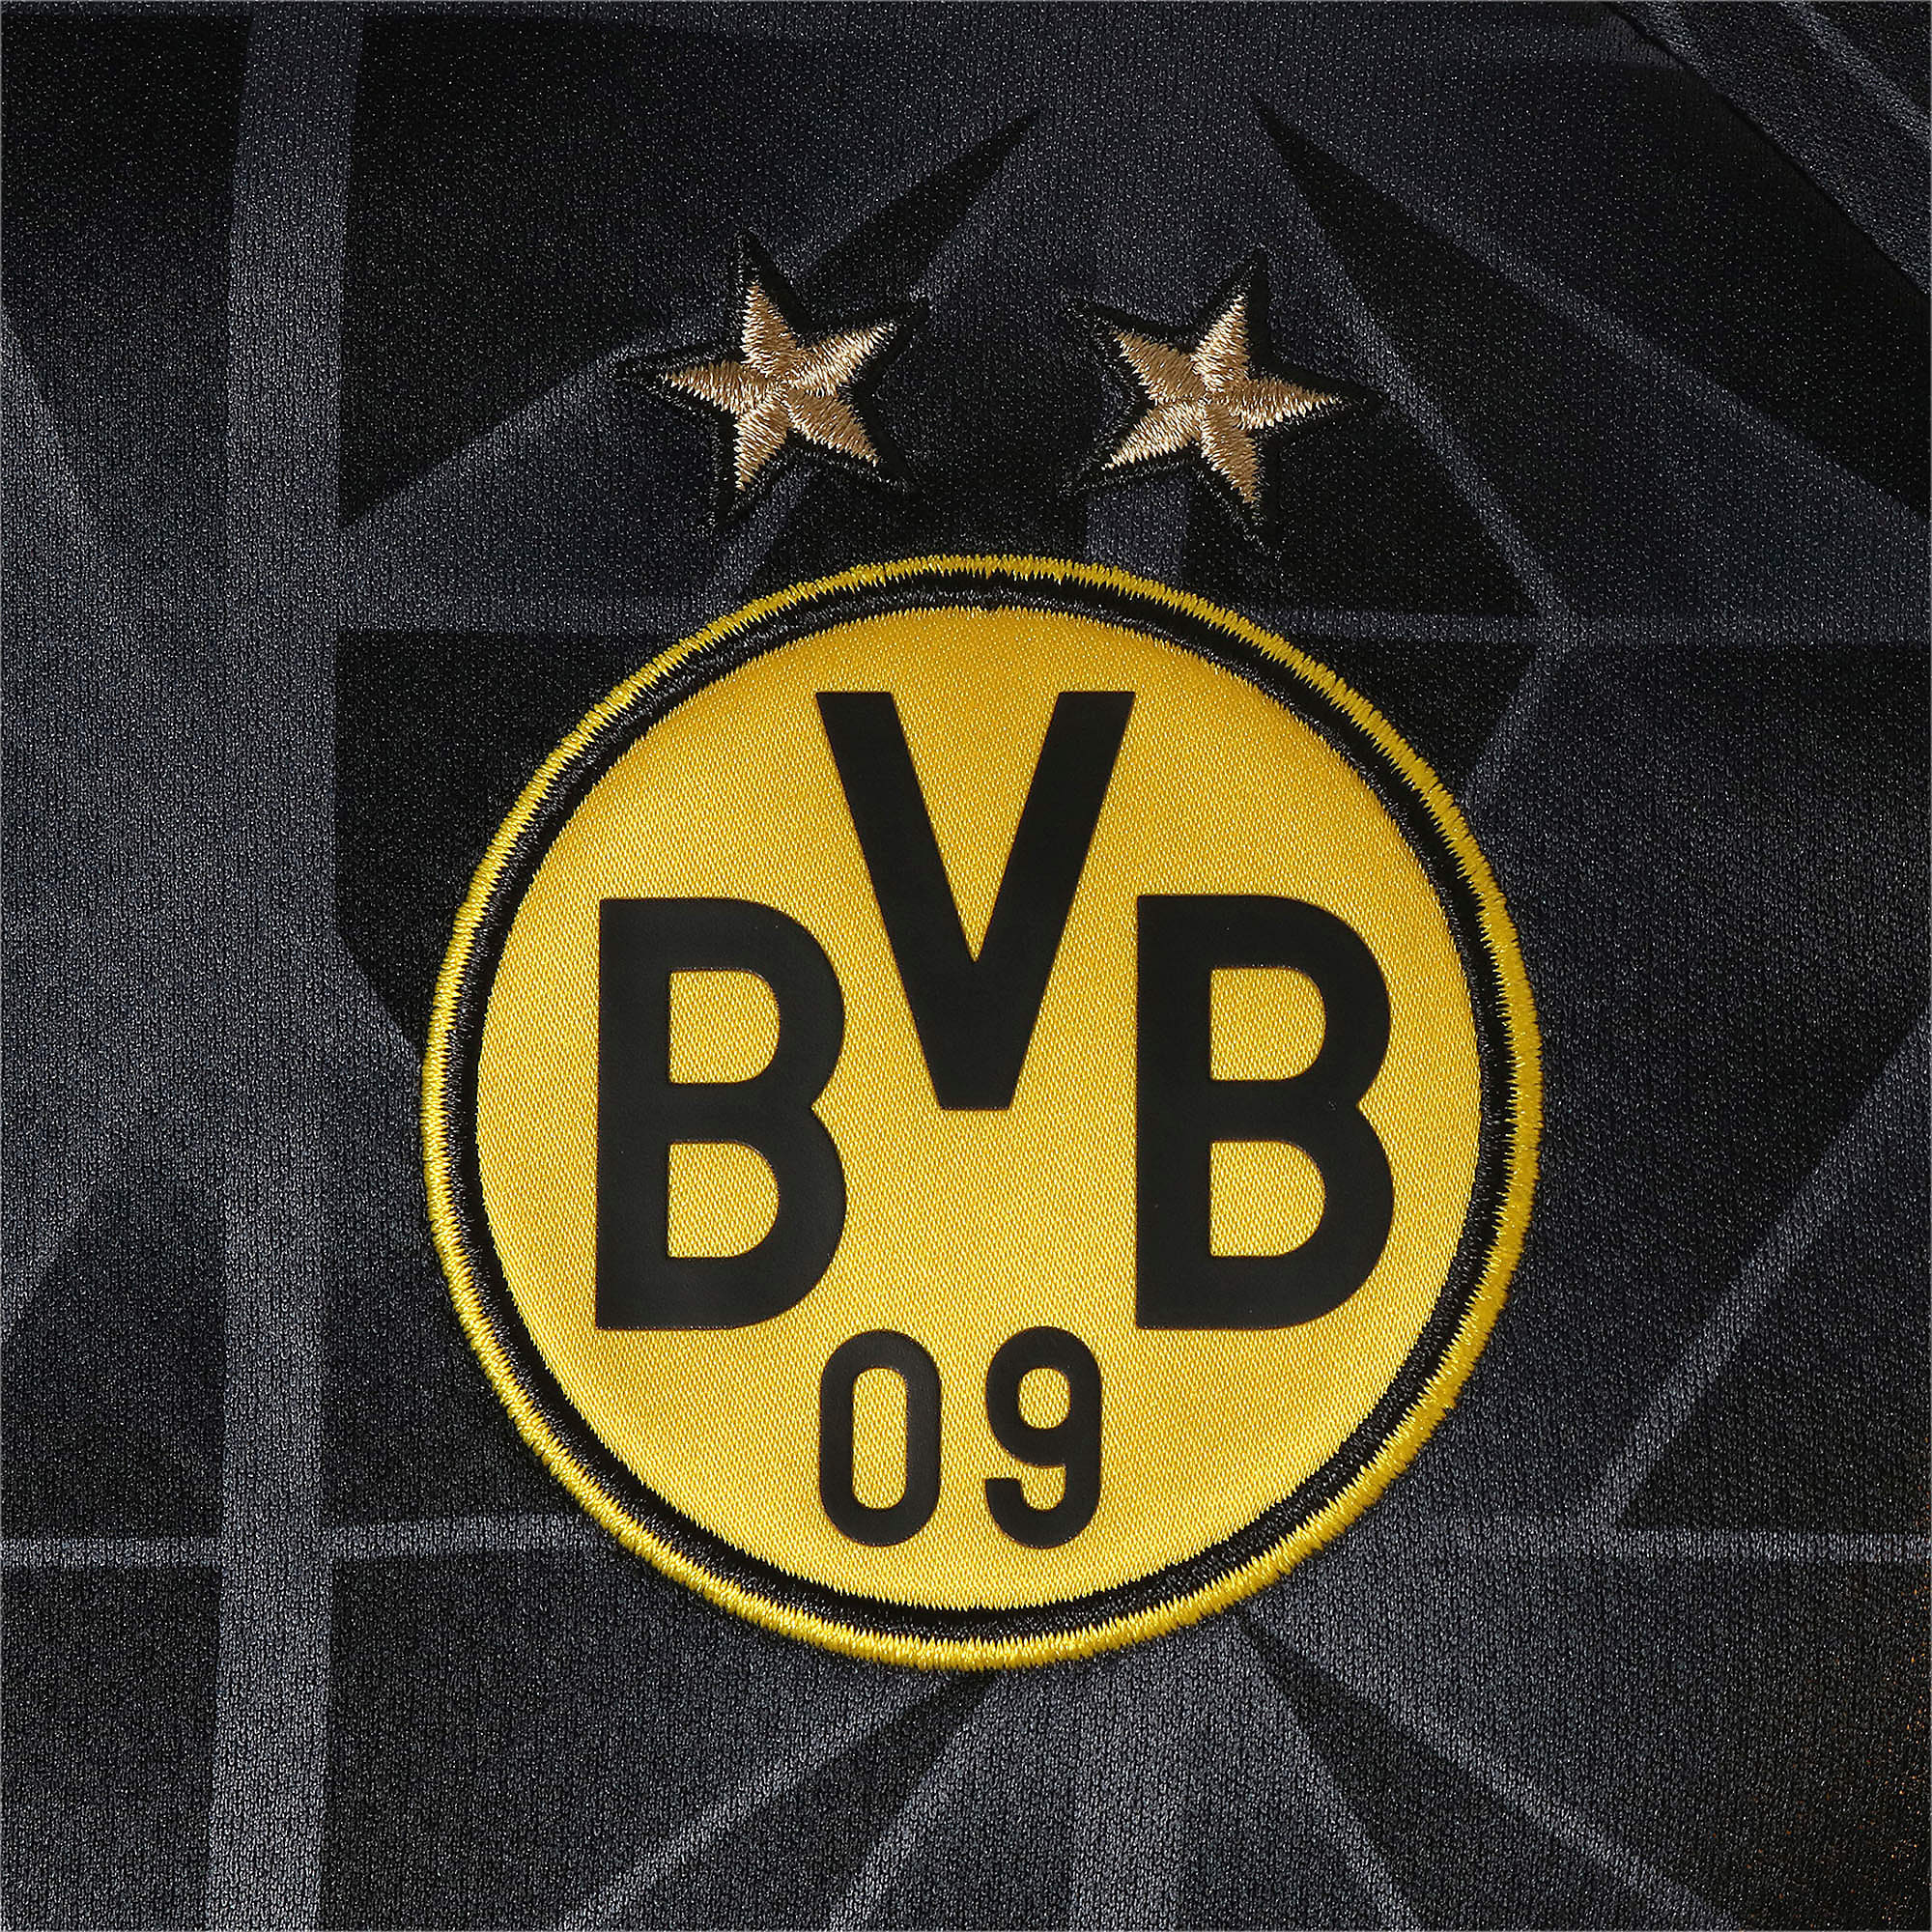 Thumbnail 8 of ドルトムント BVB SS カップ レプリカシャツ (半袖), Cyber Yellow-Puma Black, medium-JPN